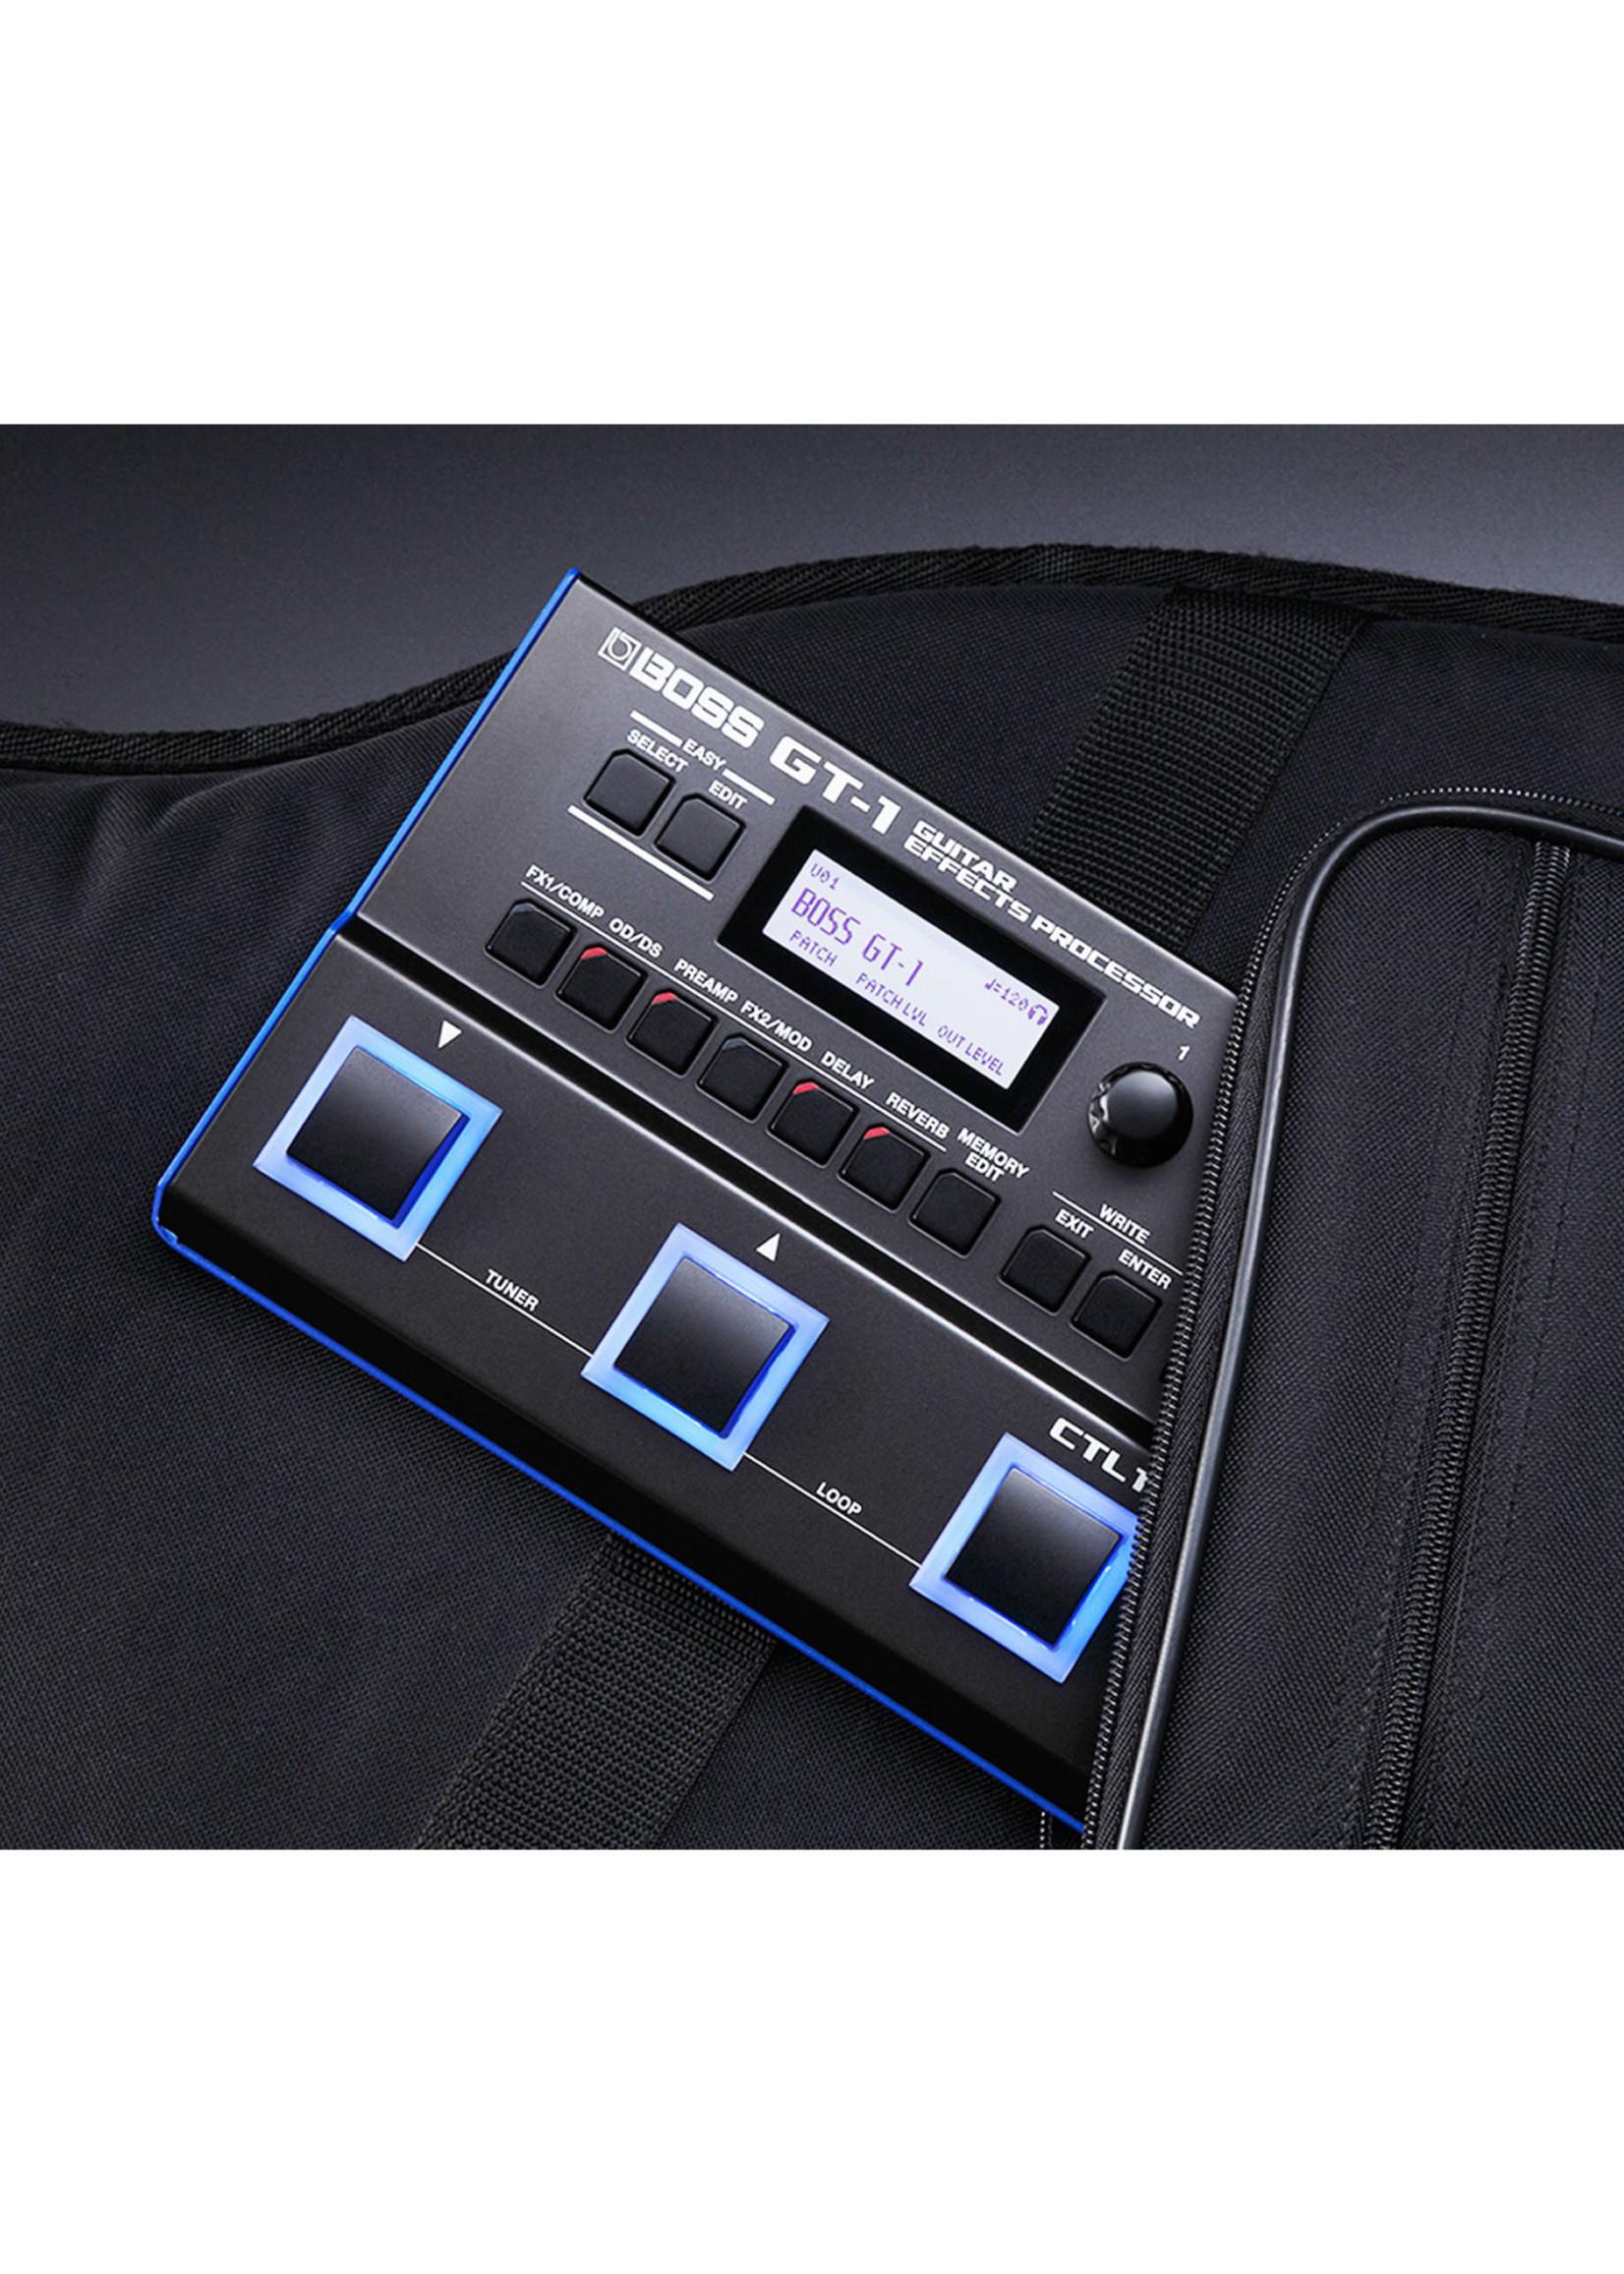 Boss Boss GT-1 Guitar Multi-Effects Processor